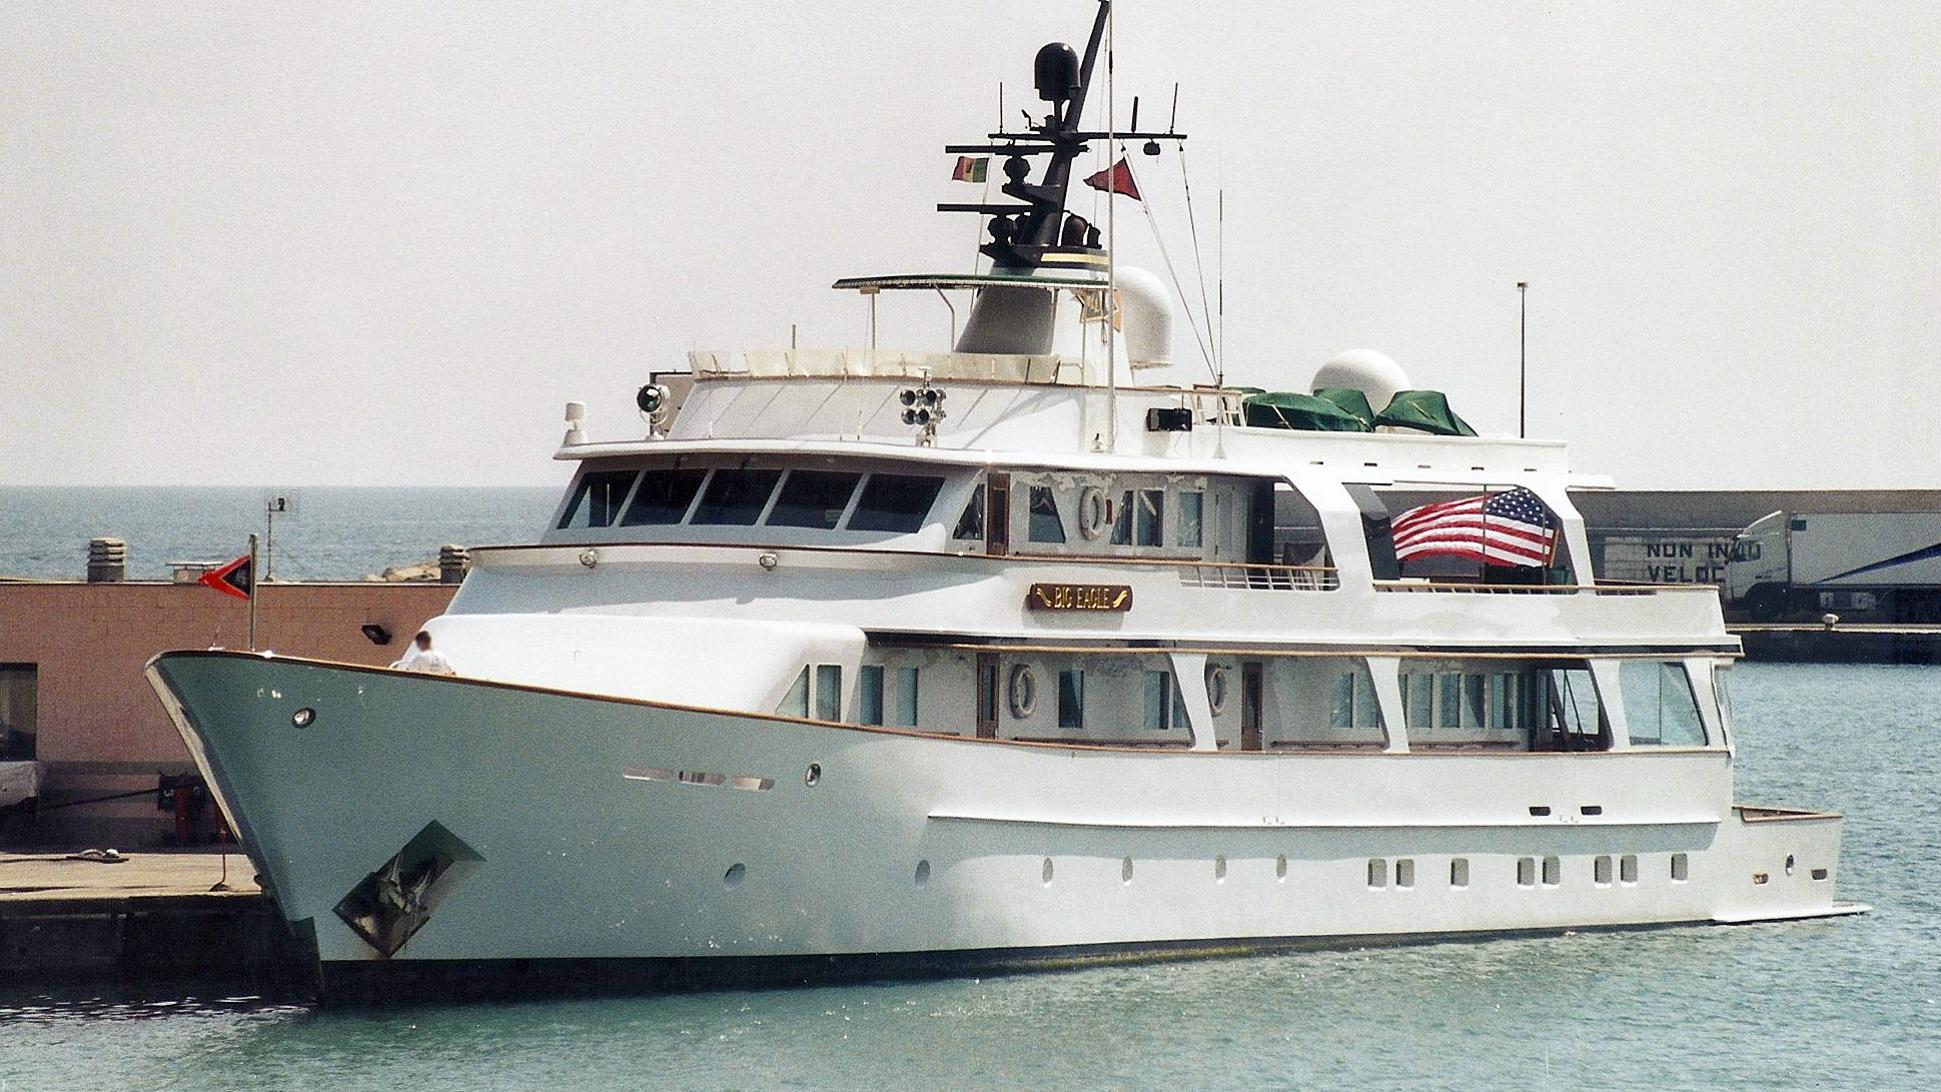 big-eagle-motor-yacht-mie-zosen-1980-52m-half-profile